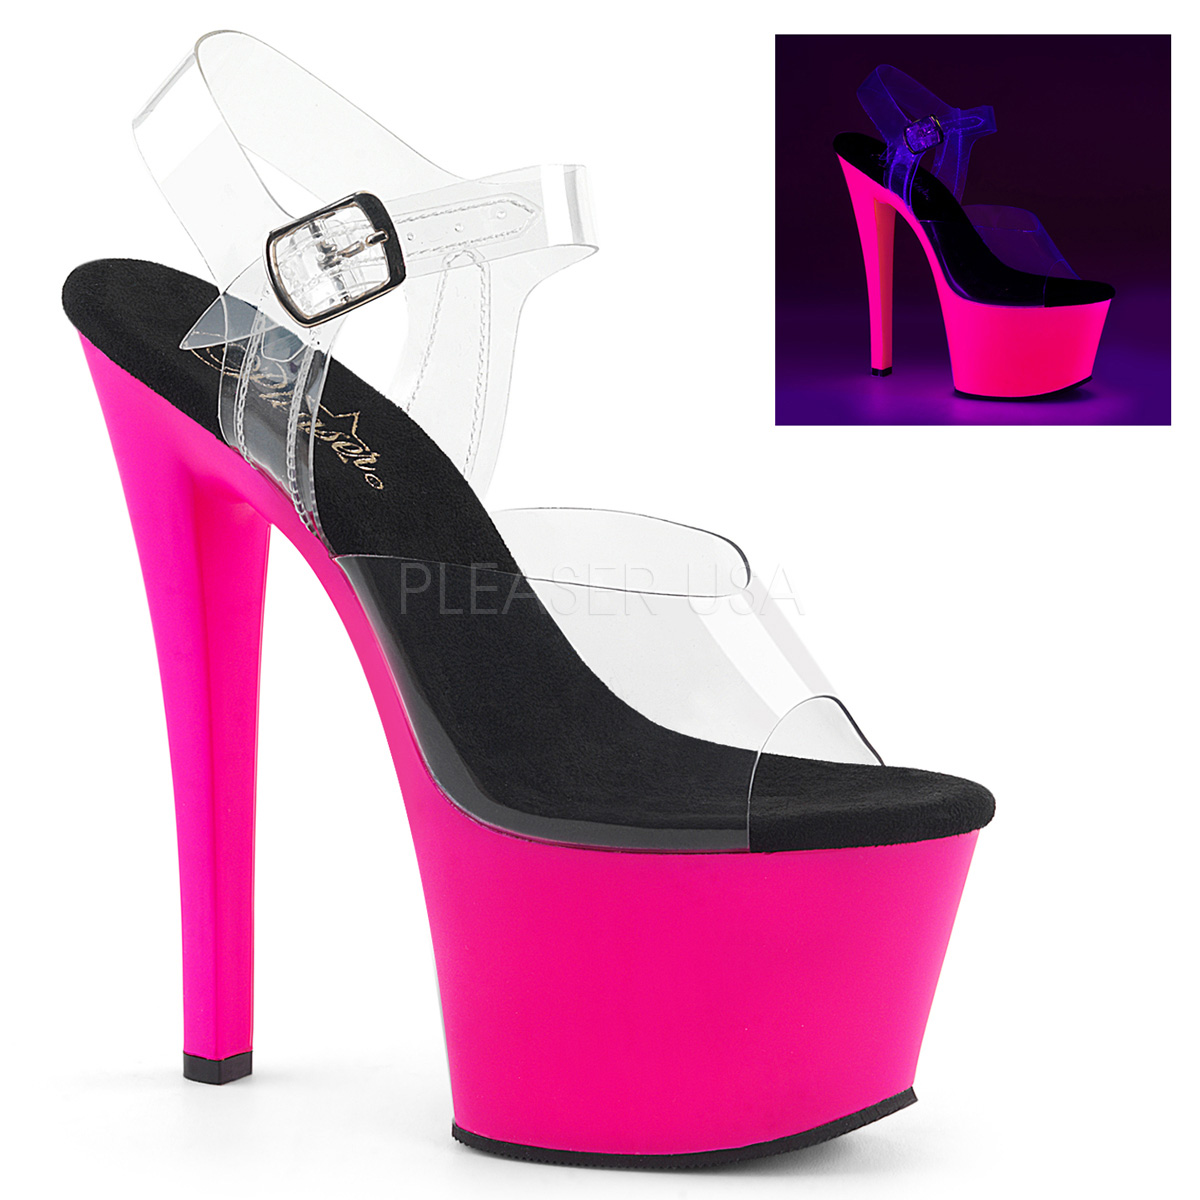 Pleaser SKY-308UV Economical, stylish, and eye-catching shoes